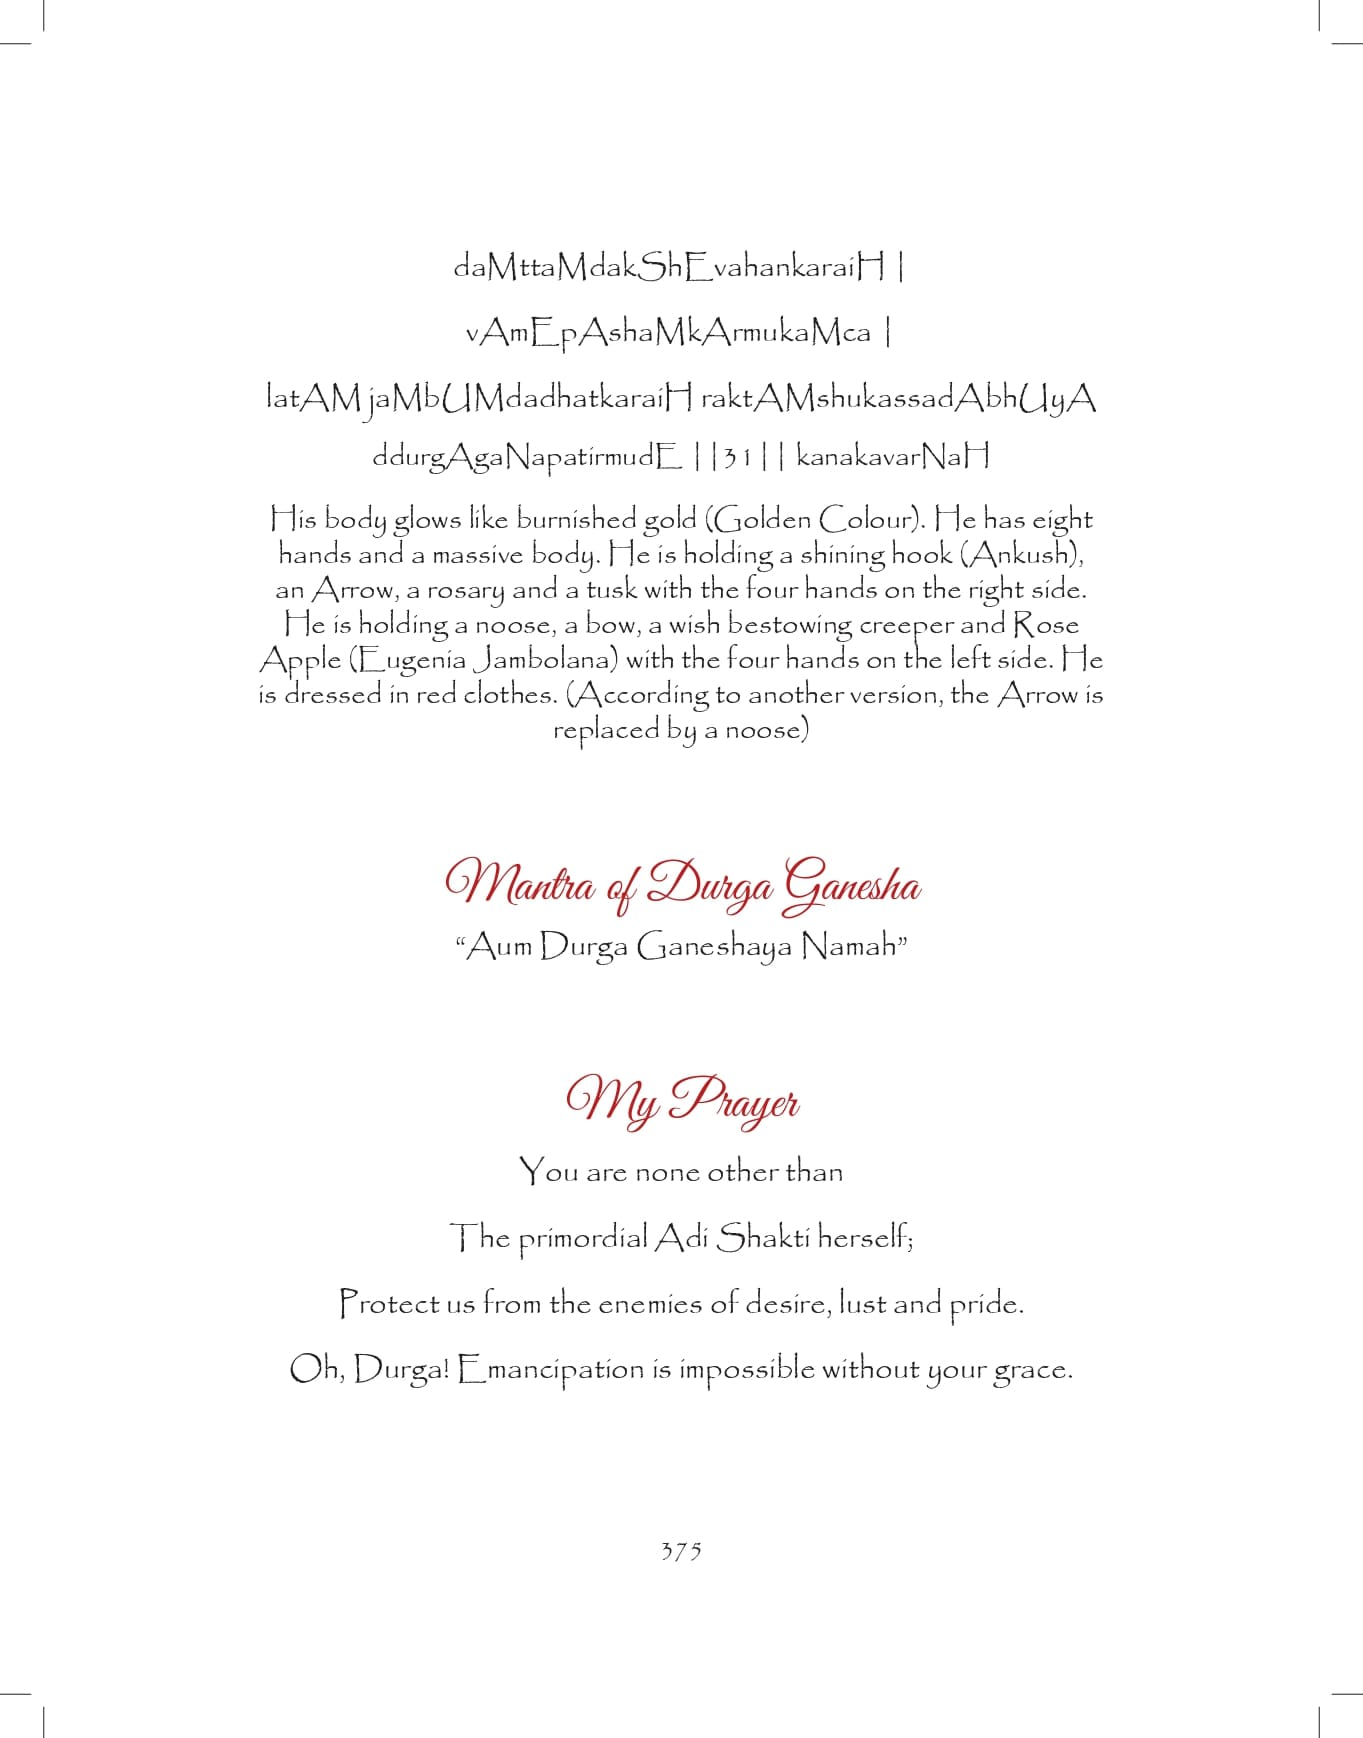 Ganesh-print_pages-to-jpg-0375.jpg